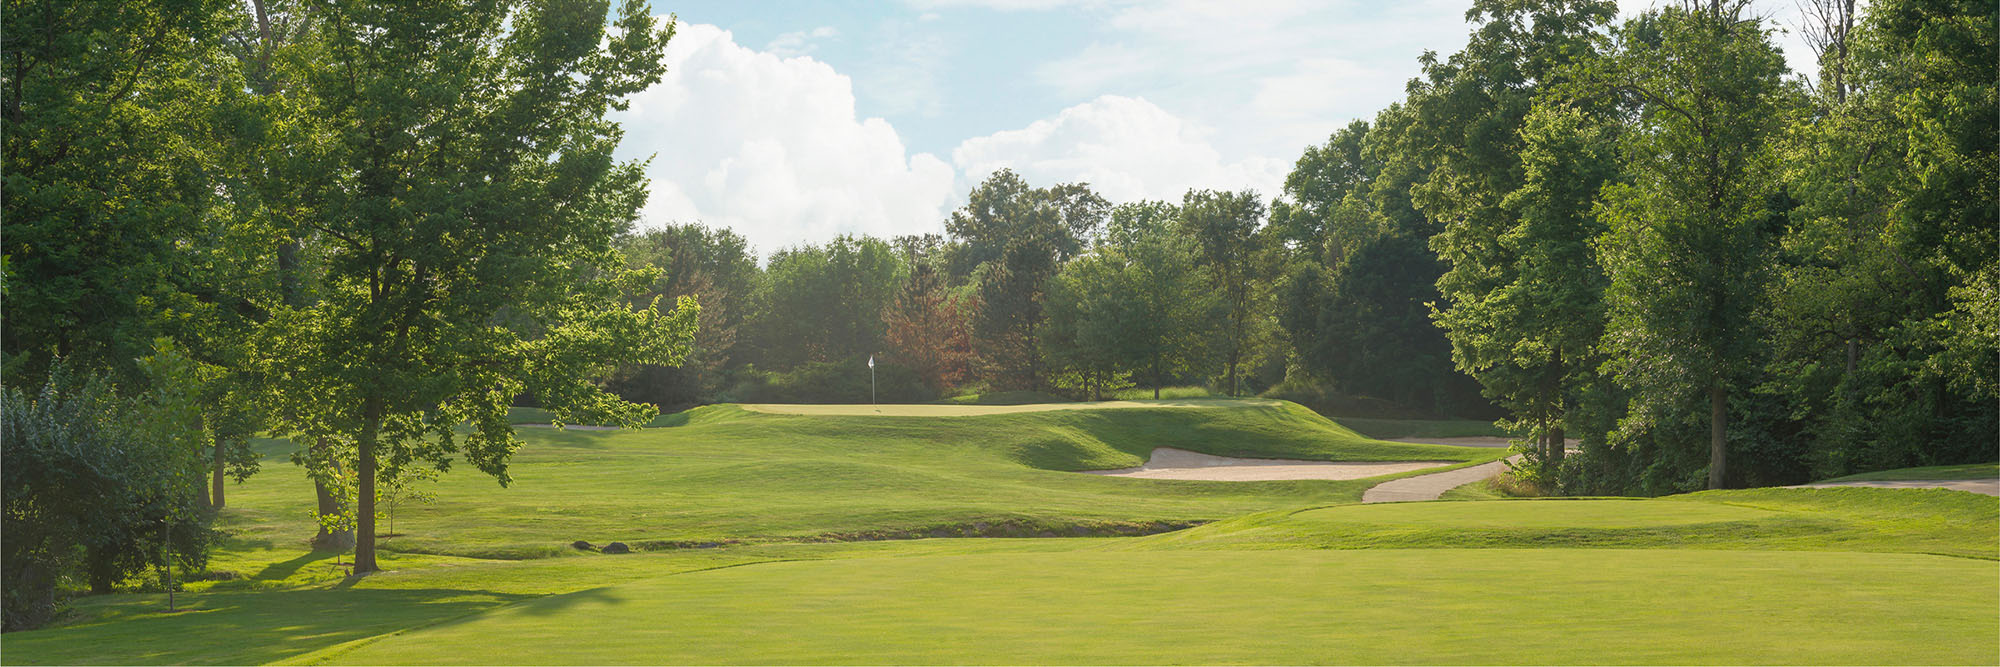 Golf Course Image - Heritage Club No. 6